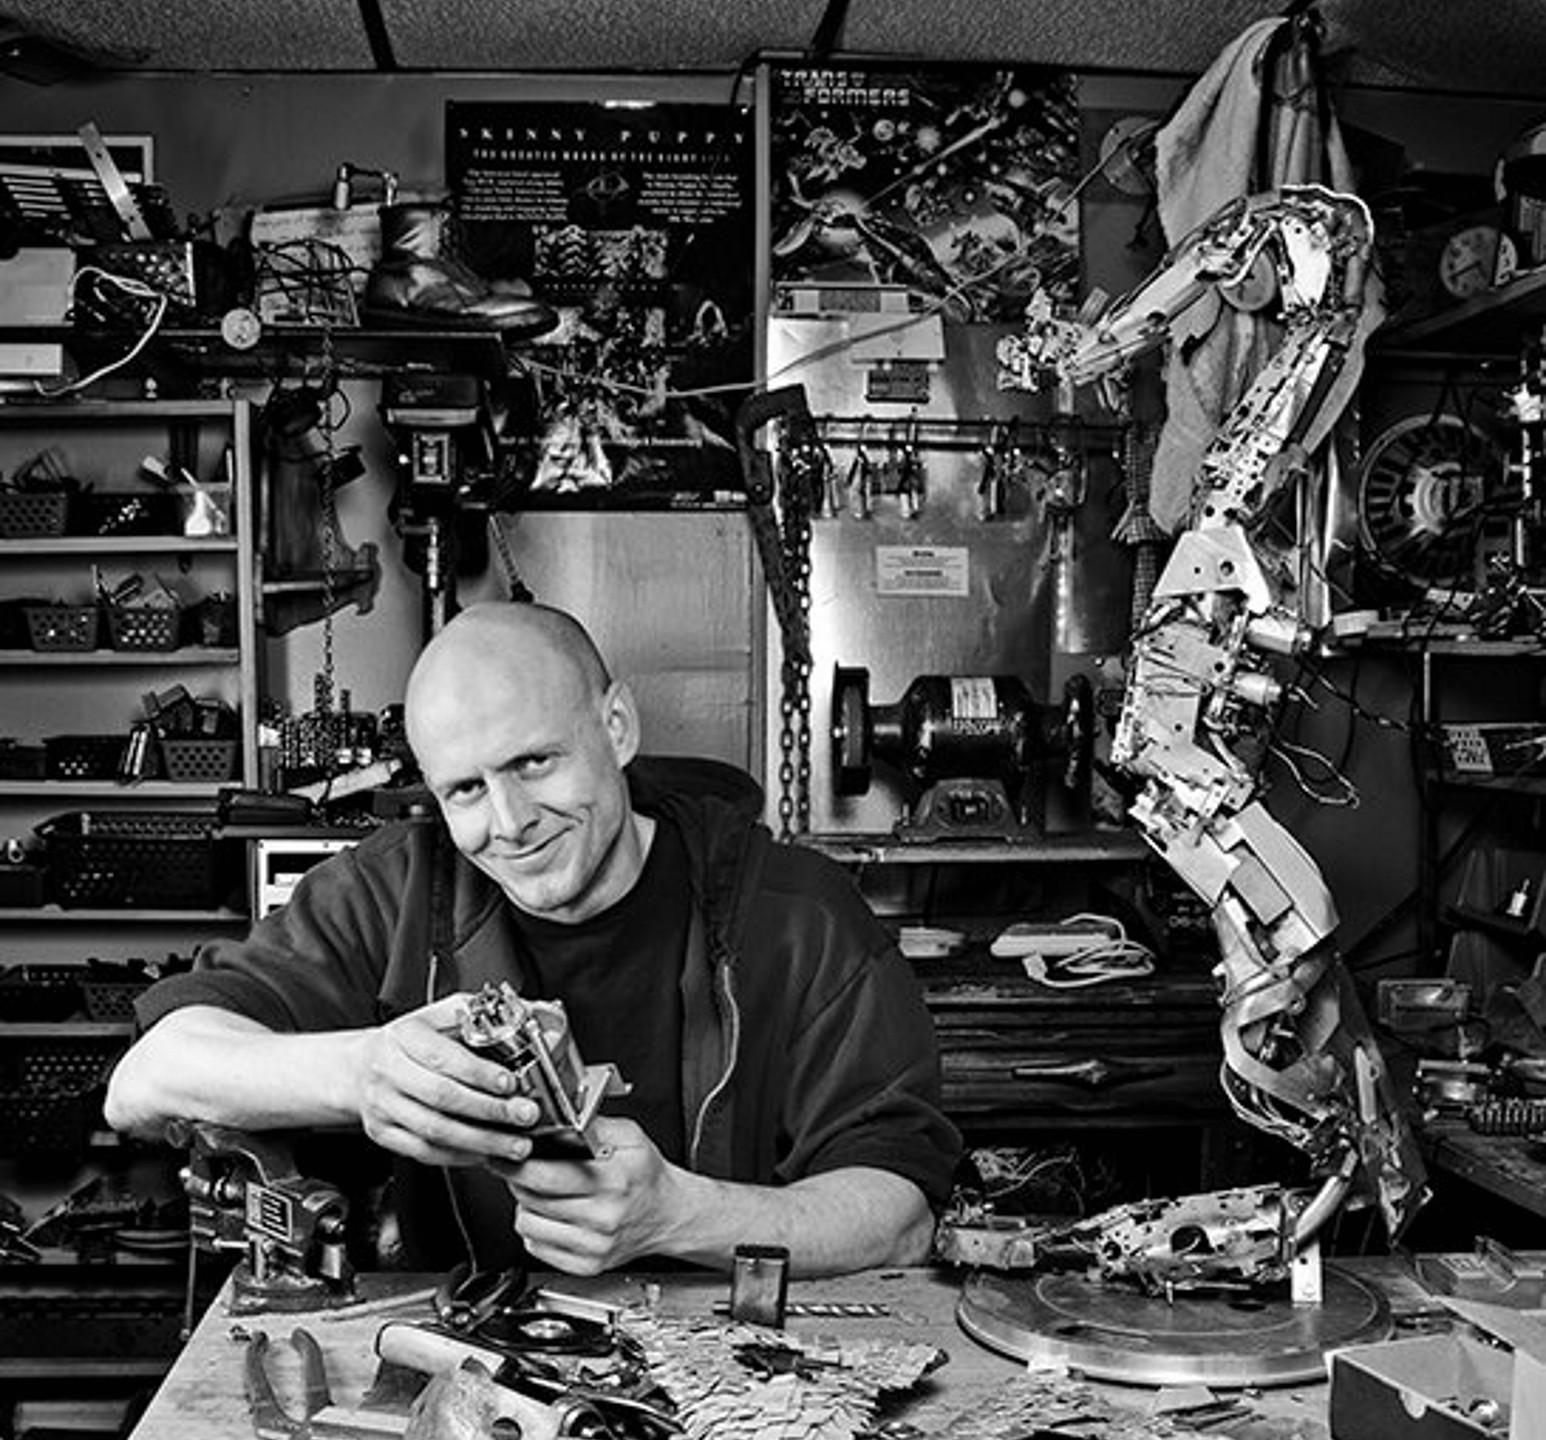 Me in the workshop - by Irvina Nuspahic